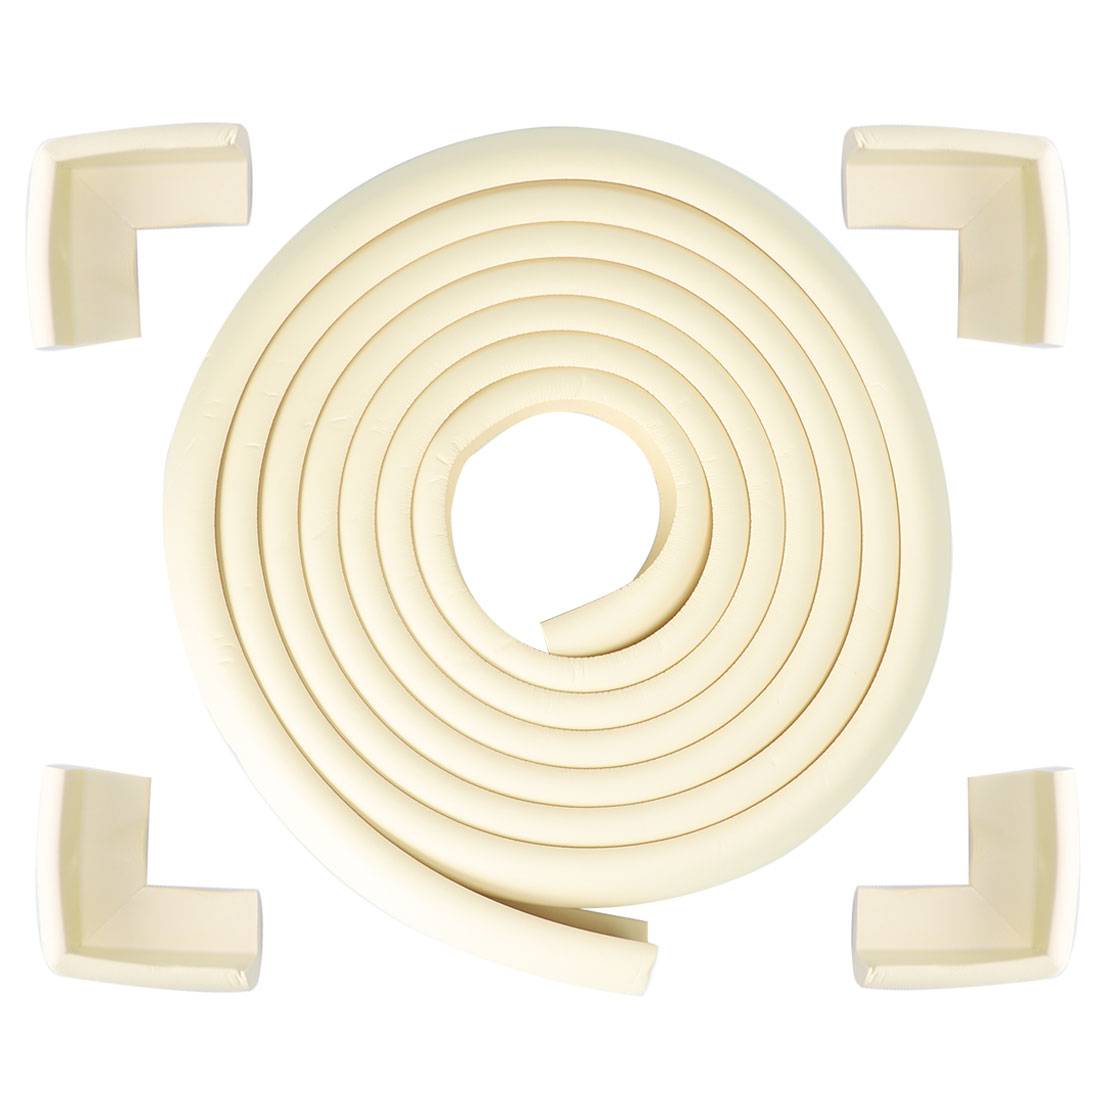 16.4ft + 4 Corner Cushions Desk Edge Foam Corner Cushion Guard Protector, Beige